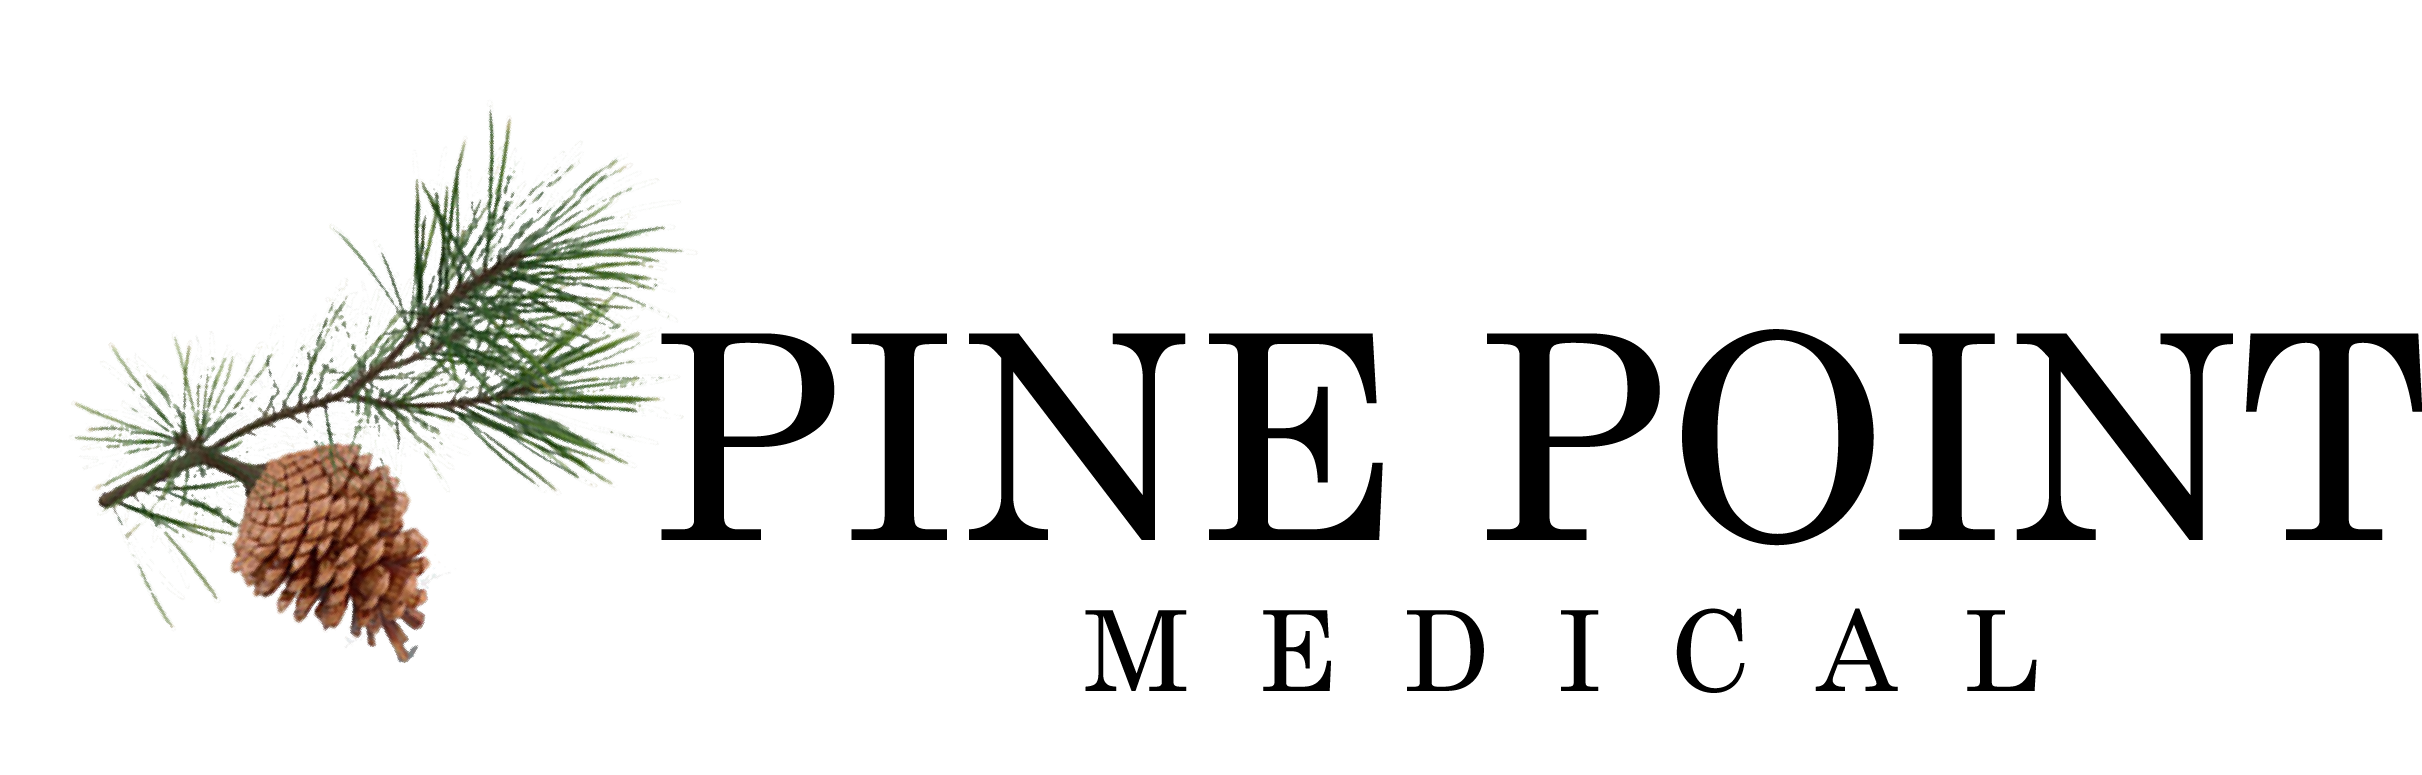 Pine Point Medical Logo